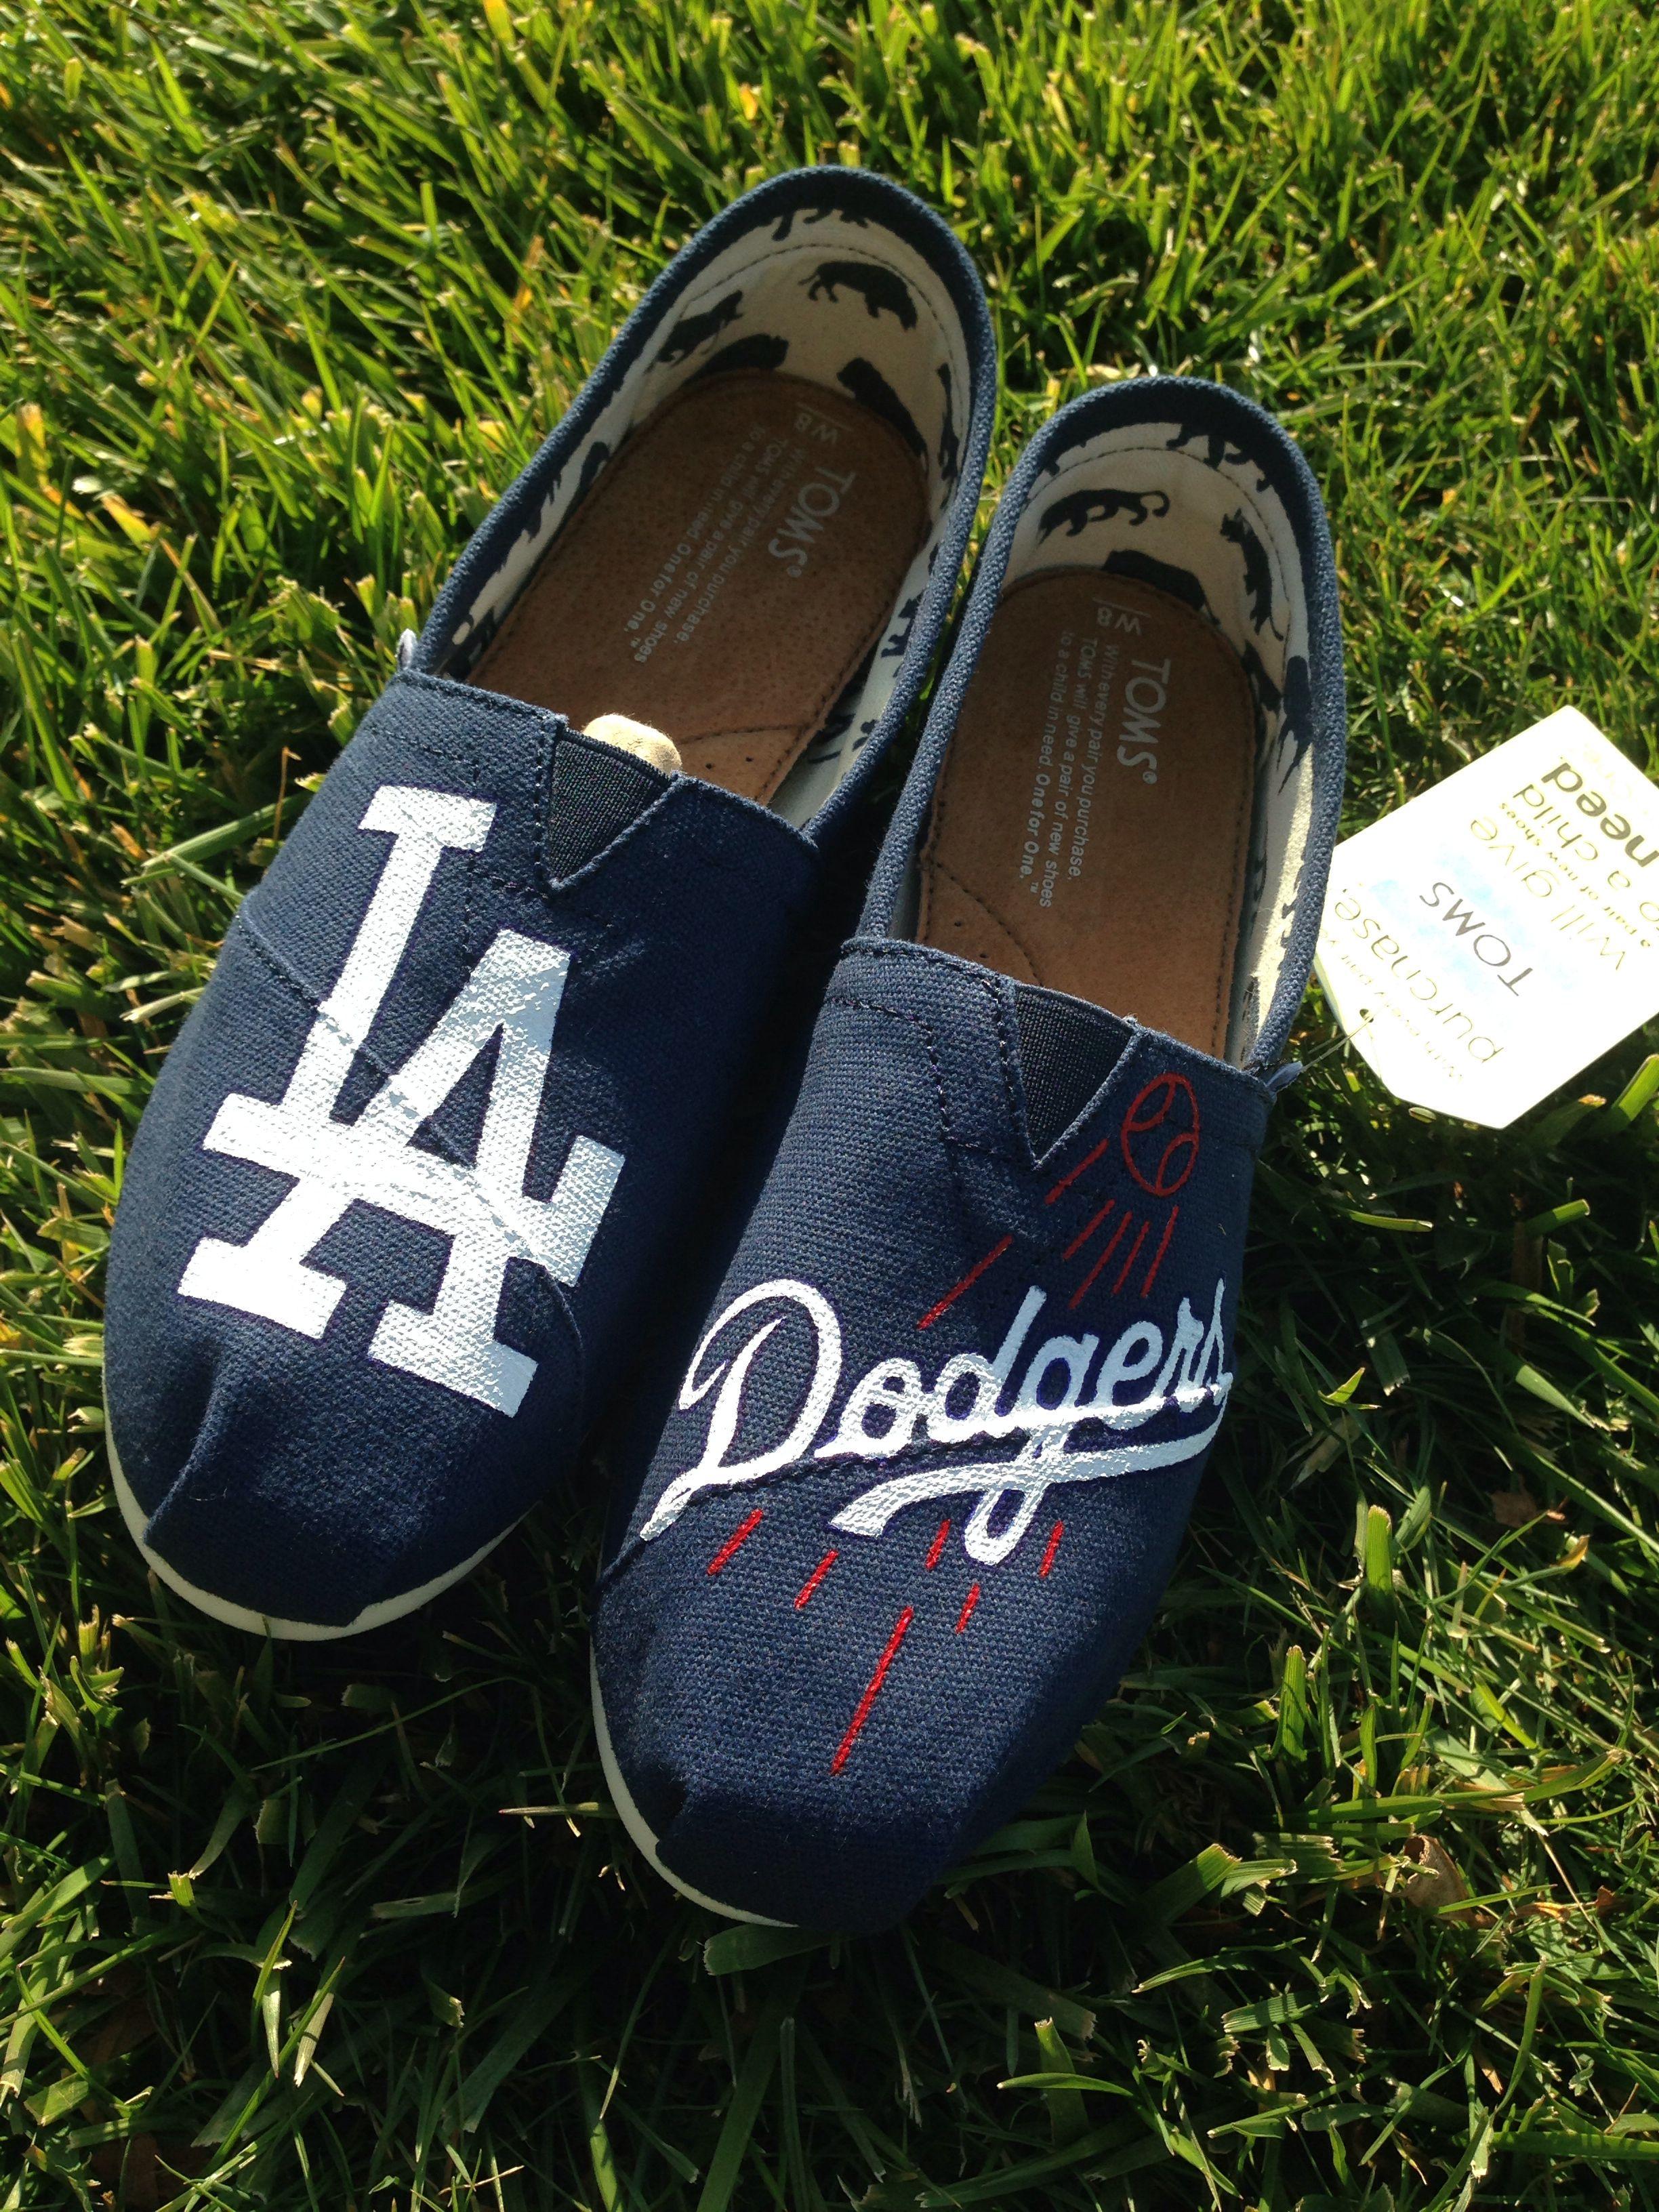 Custom Los Angeles Dodgers Toms women's